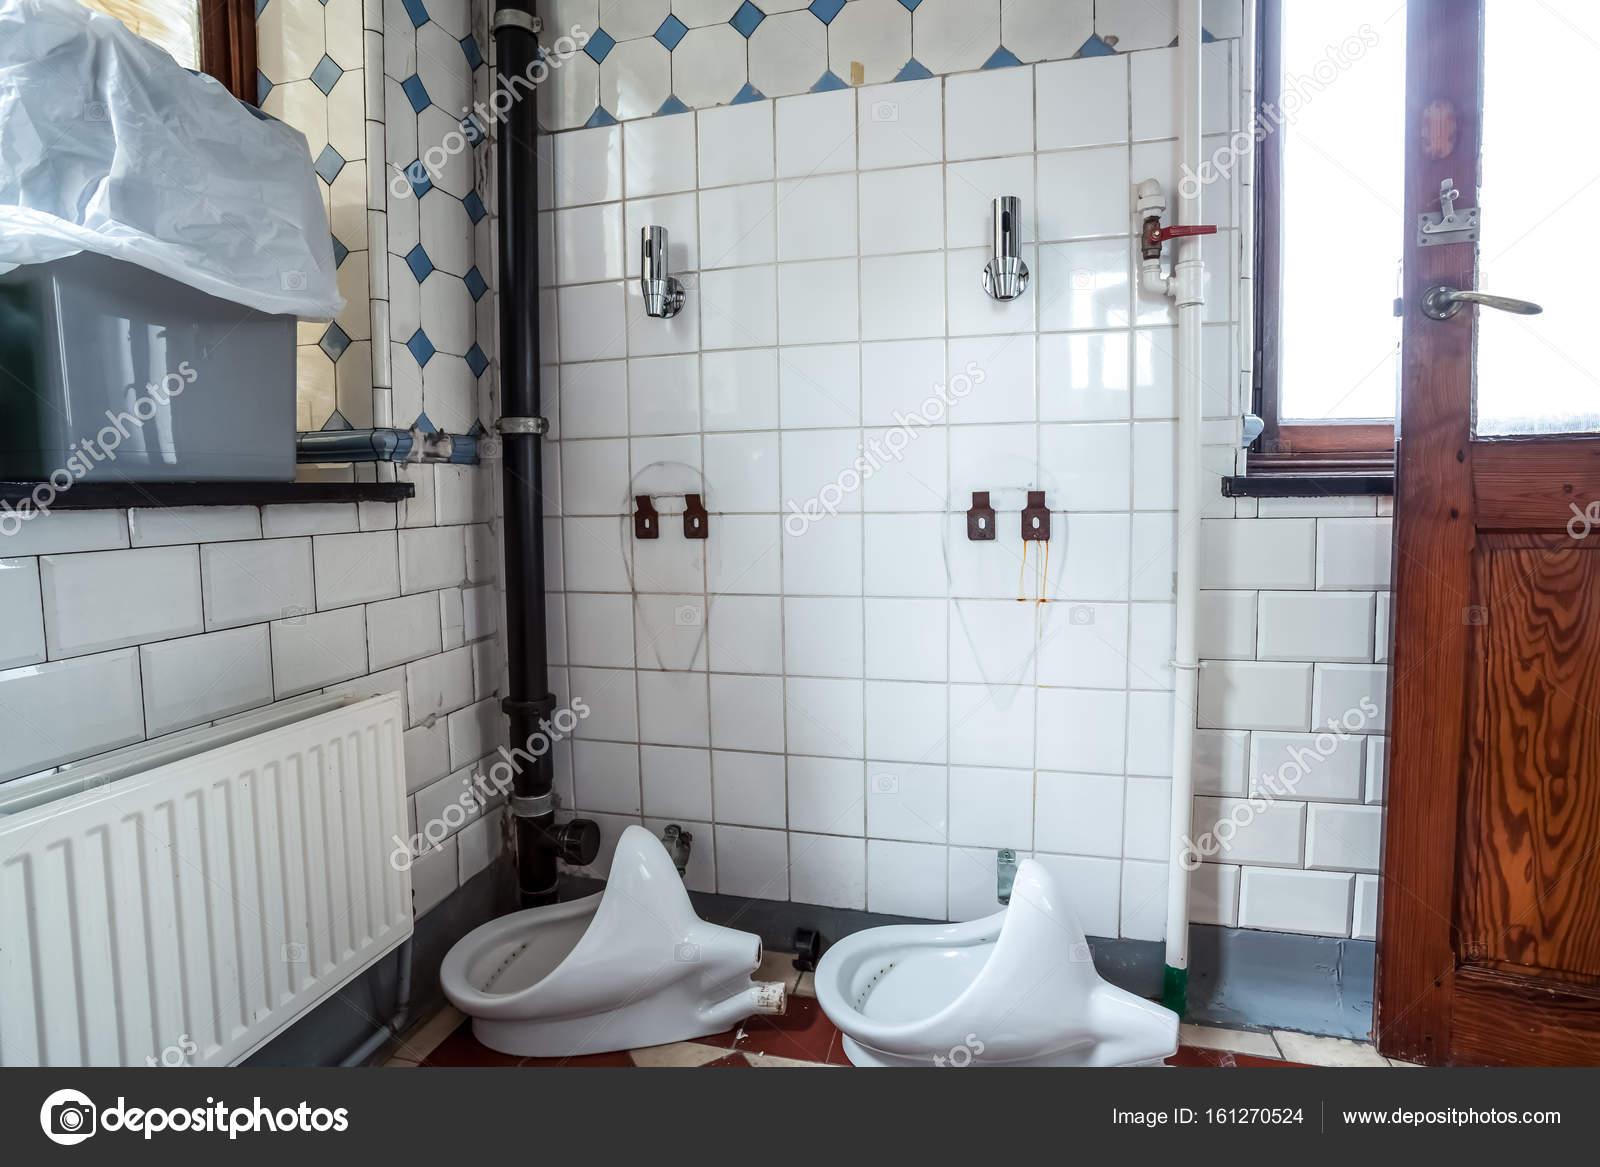 Urinoir op de muur u stockfoto denboma